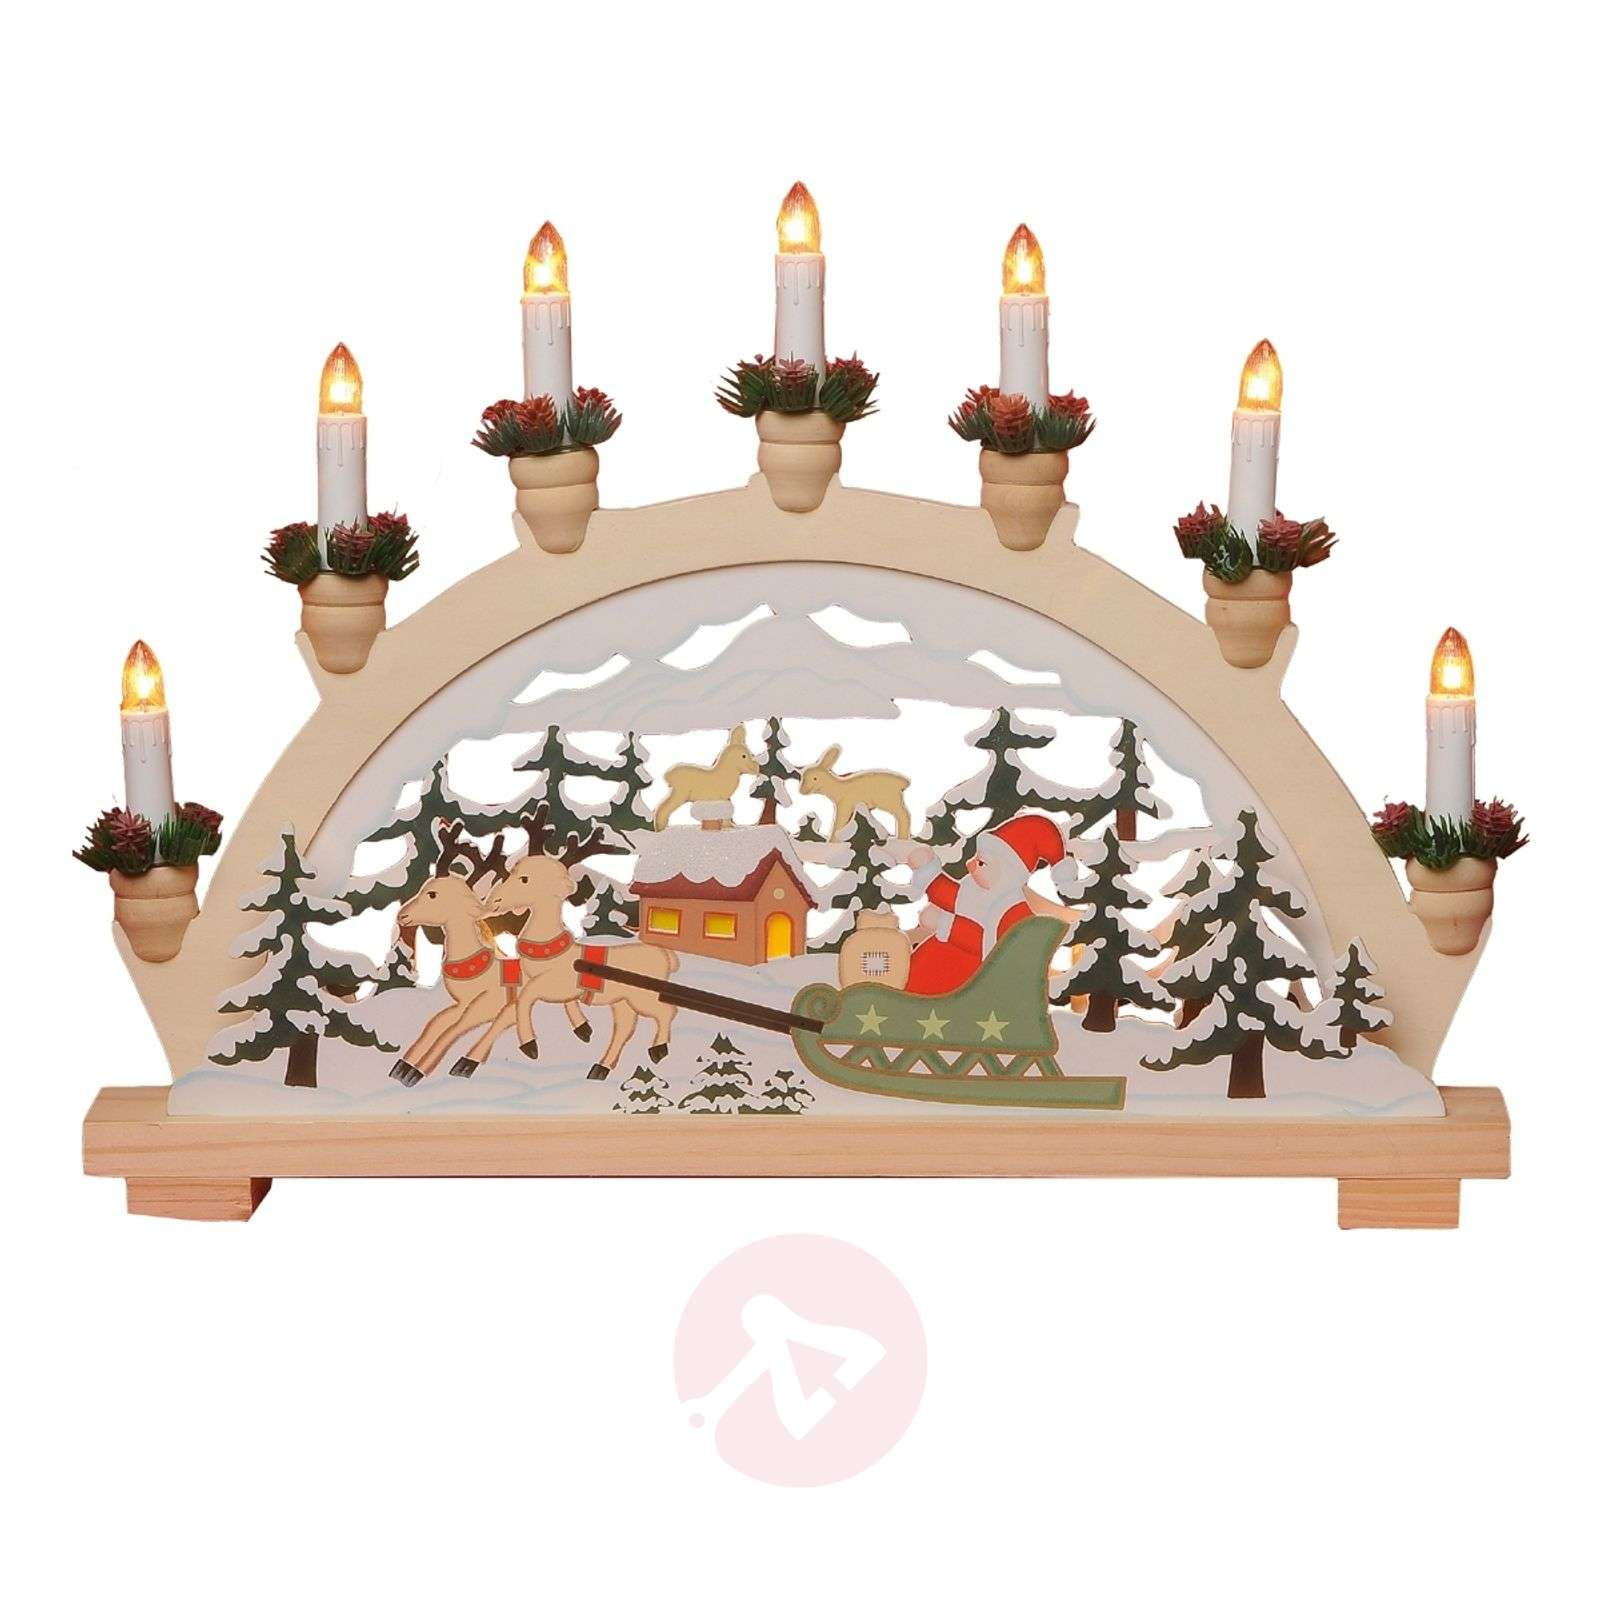 Wonderful 7-light window candle Santa Claus-1522217-01